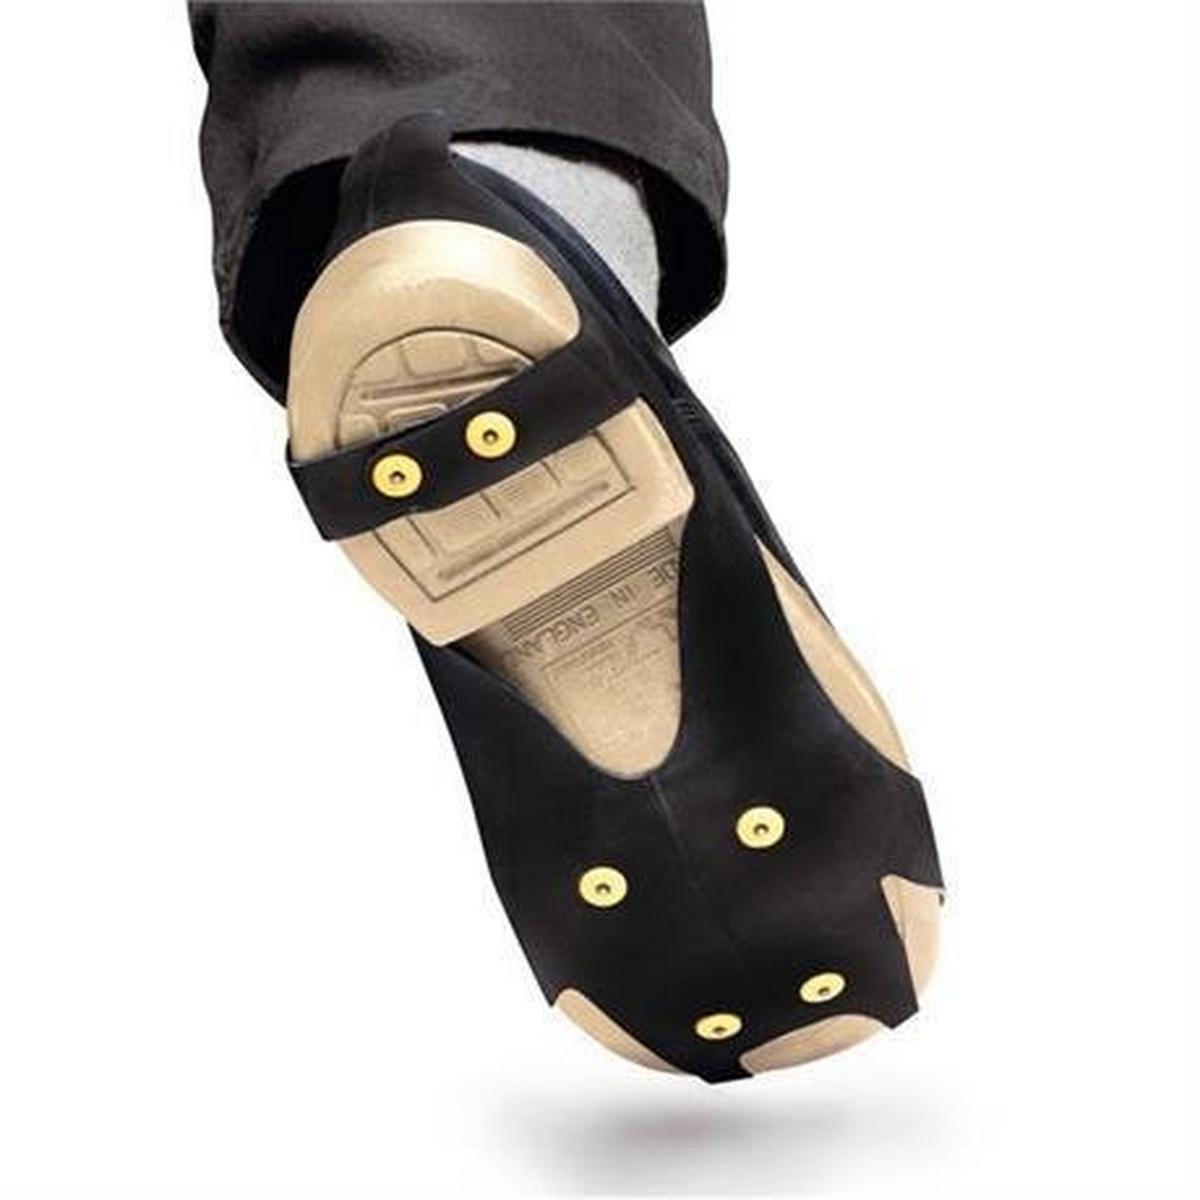 Petzl Charlet Petzl Spiky Pavement Crampon Size 3 (> EU46)